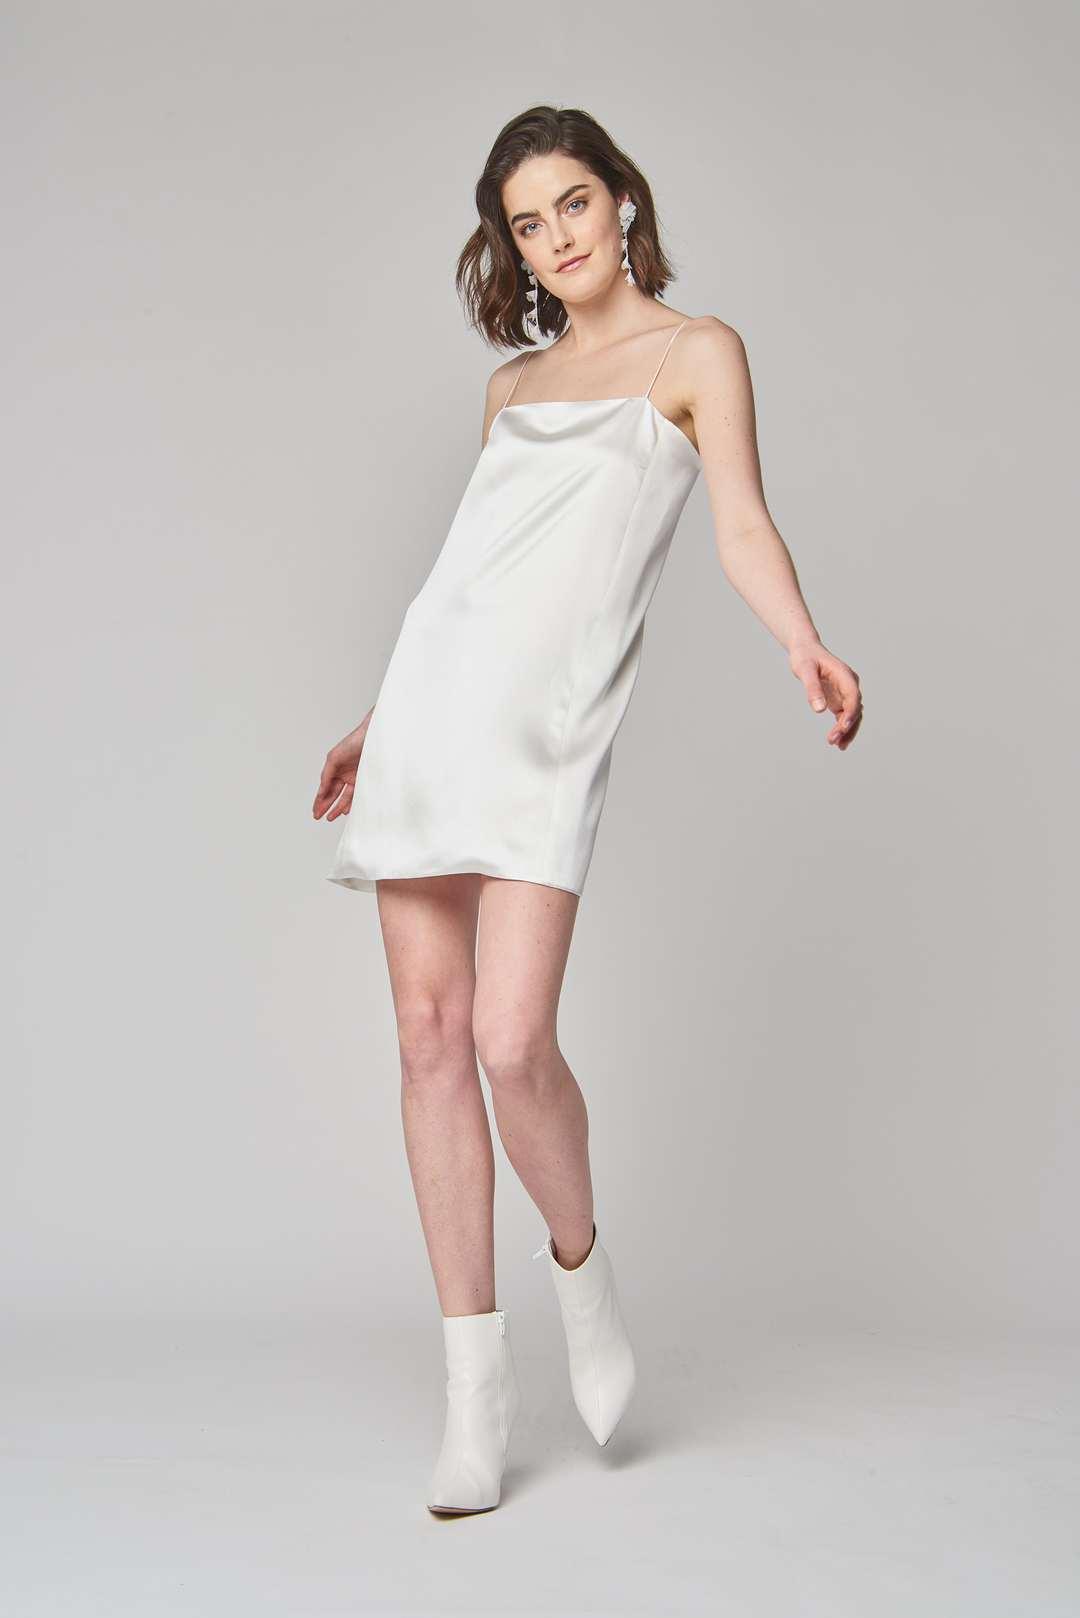 Dress main 2x file